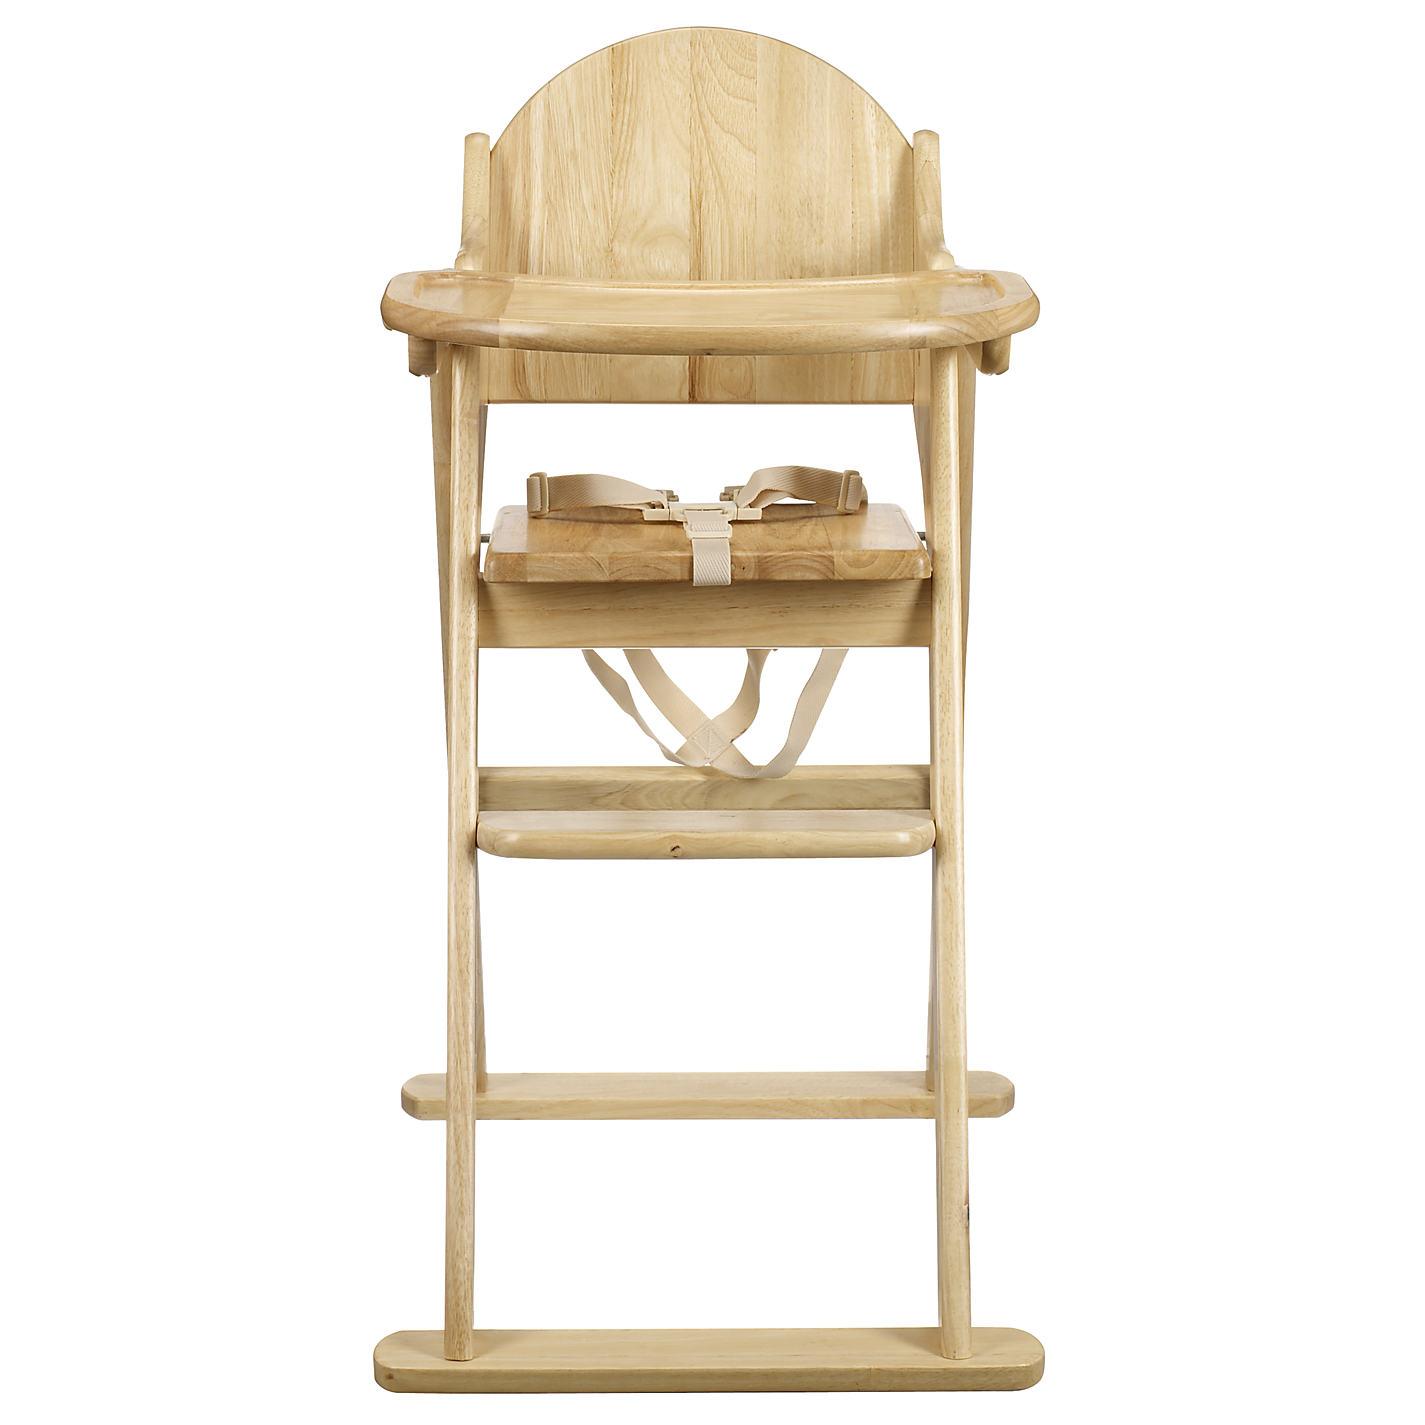 Buy East Coast Folding Wood Highchair